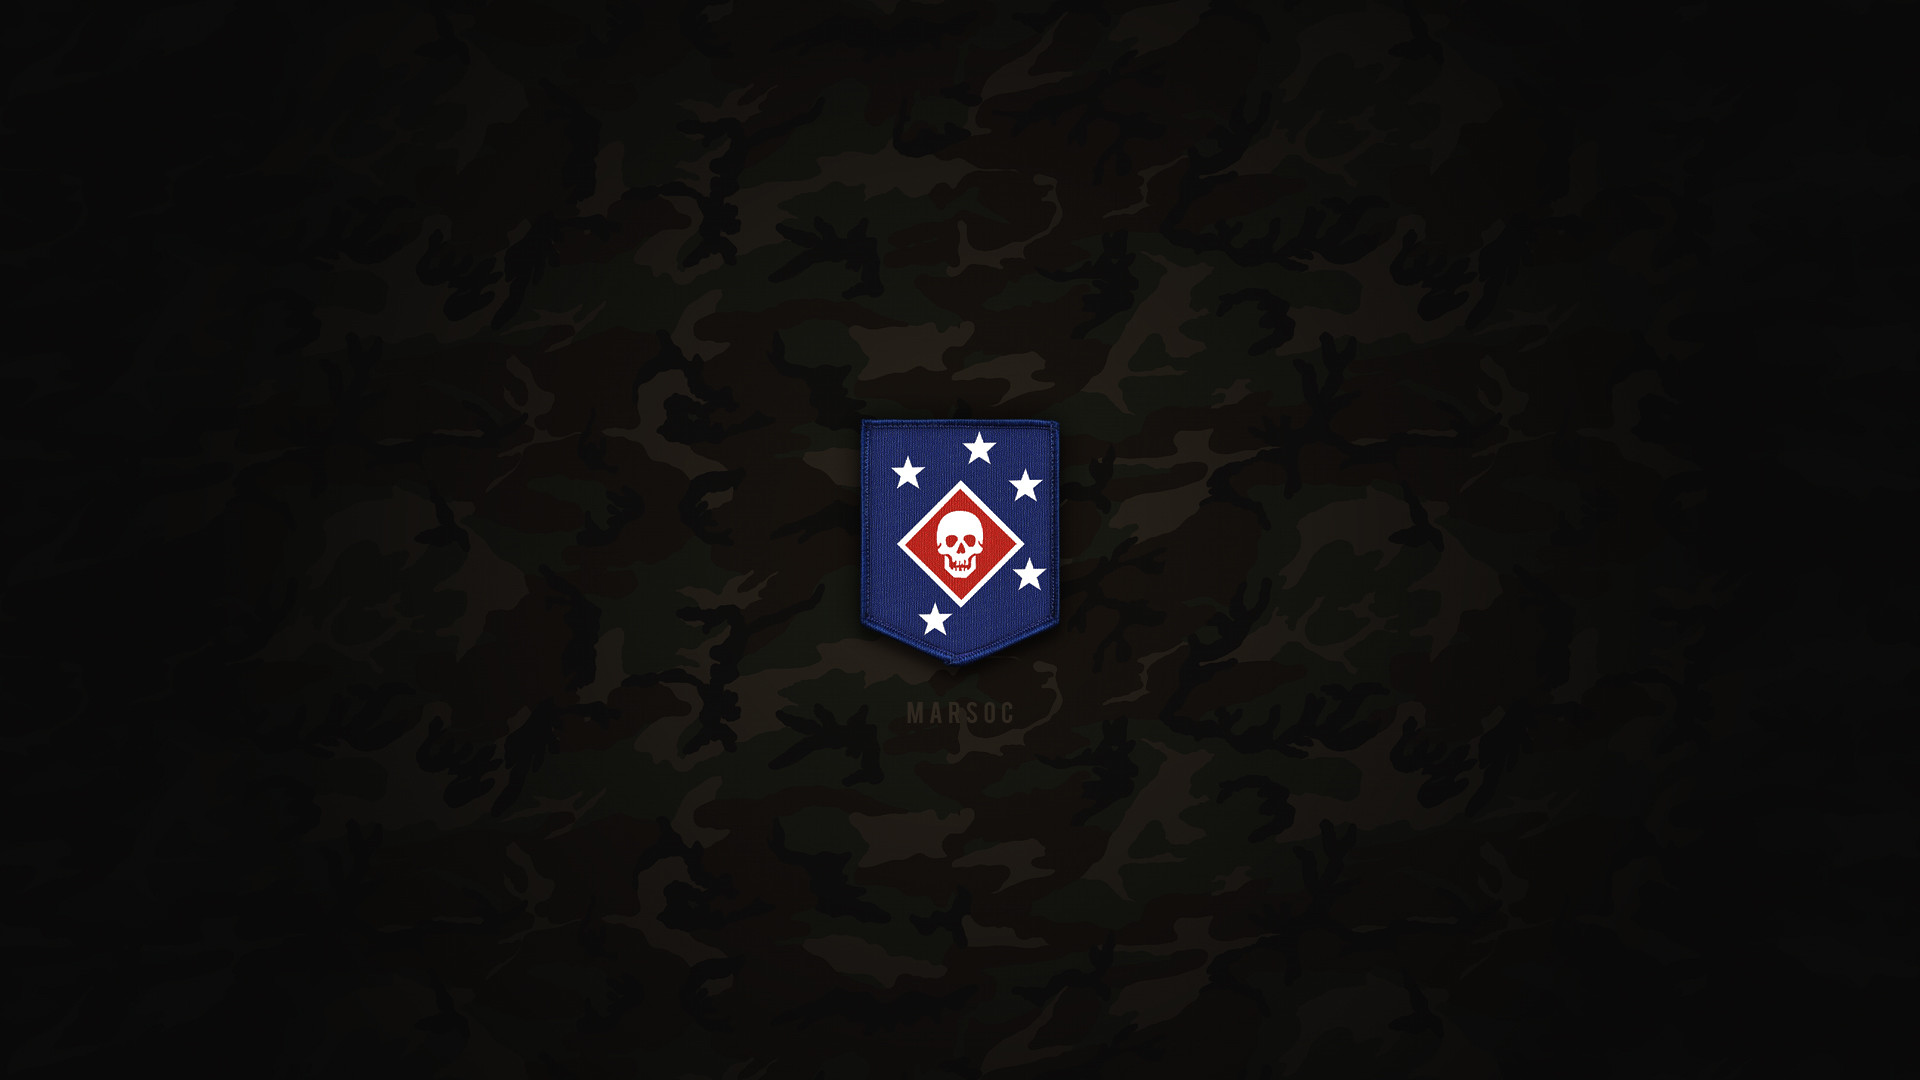 … Marine Raider Patch   MARSOC   HD Wallpaper by ignitedkaos